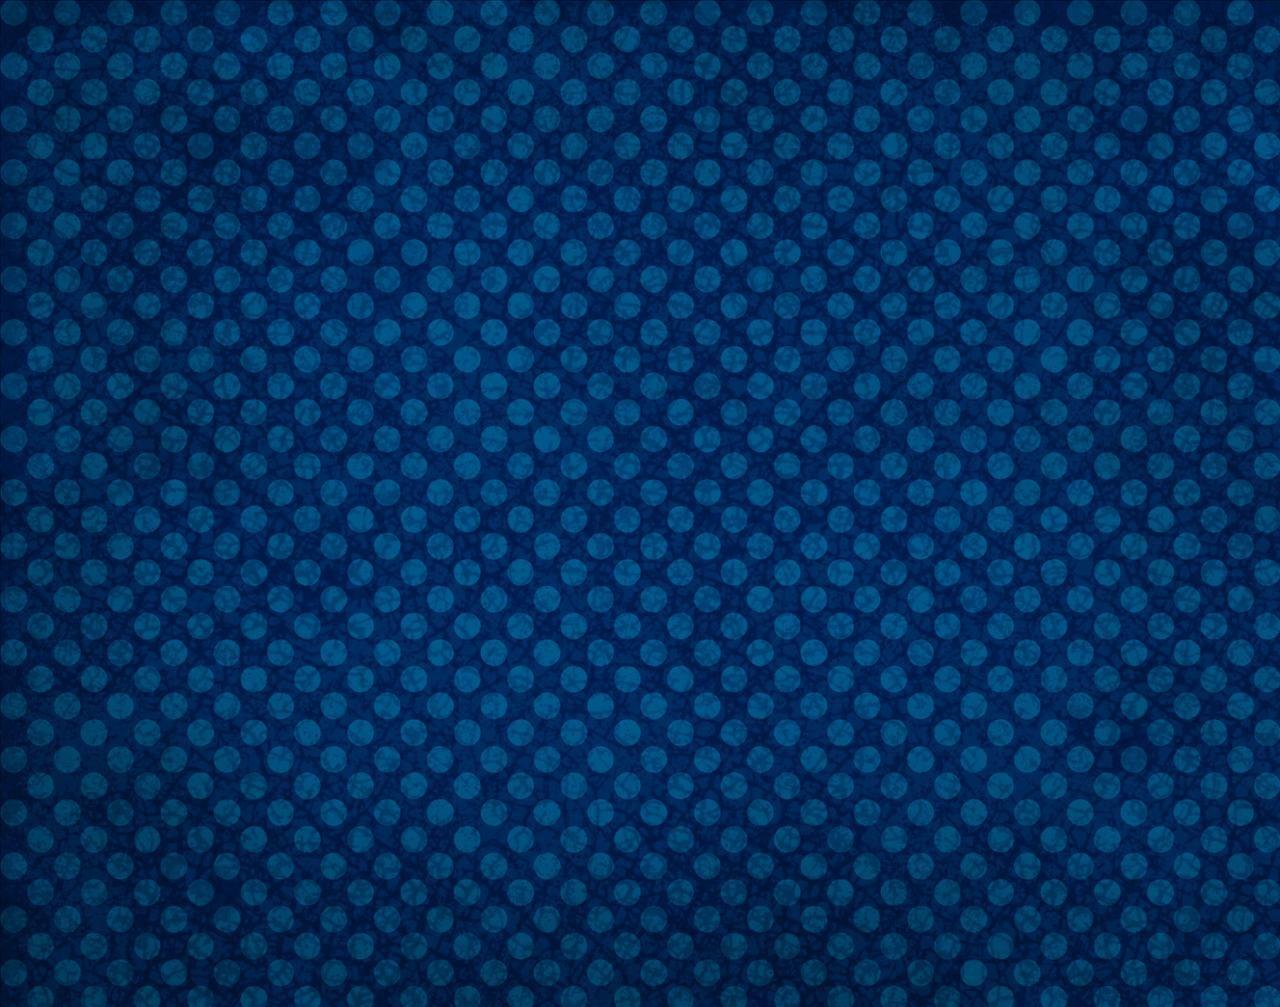 Download 1280x960 surface, solid, blue, dark Wallpaper